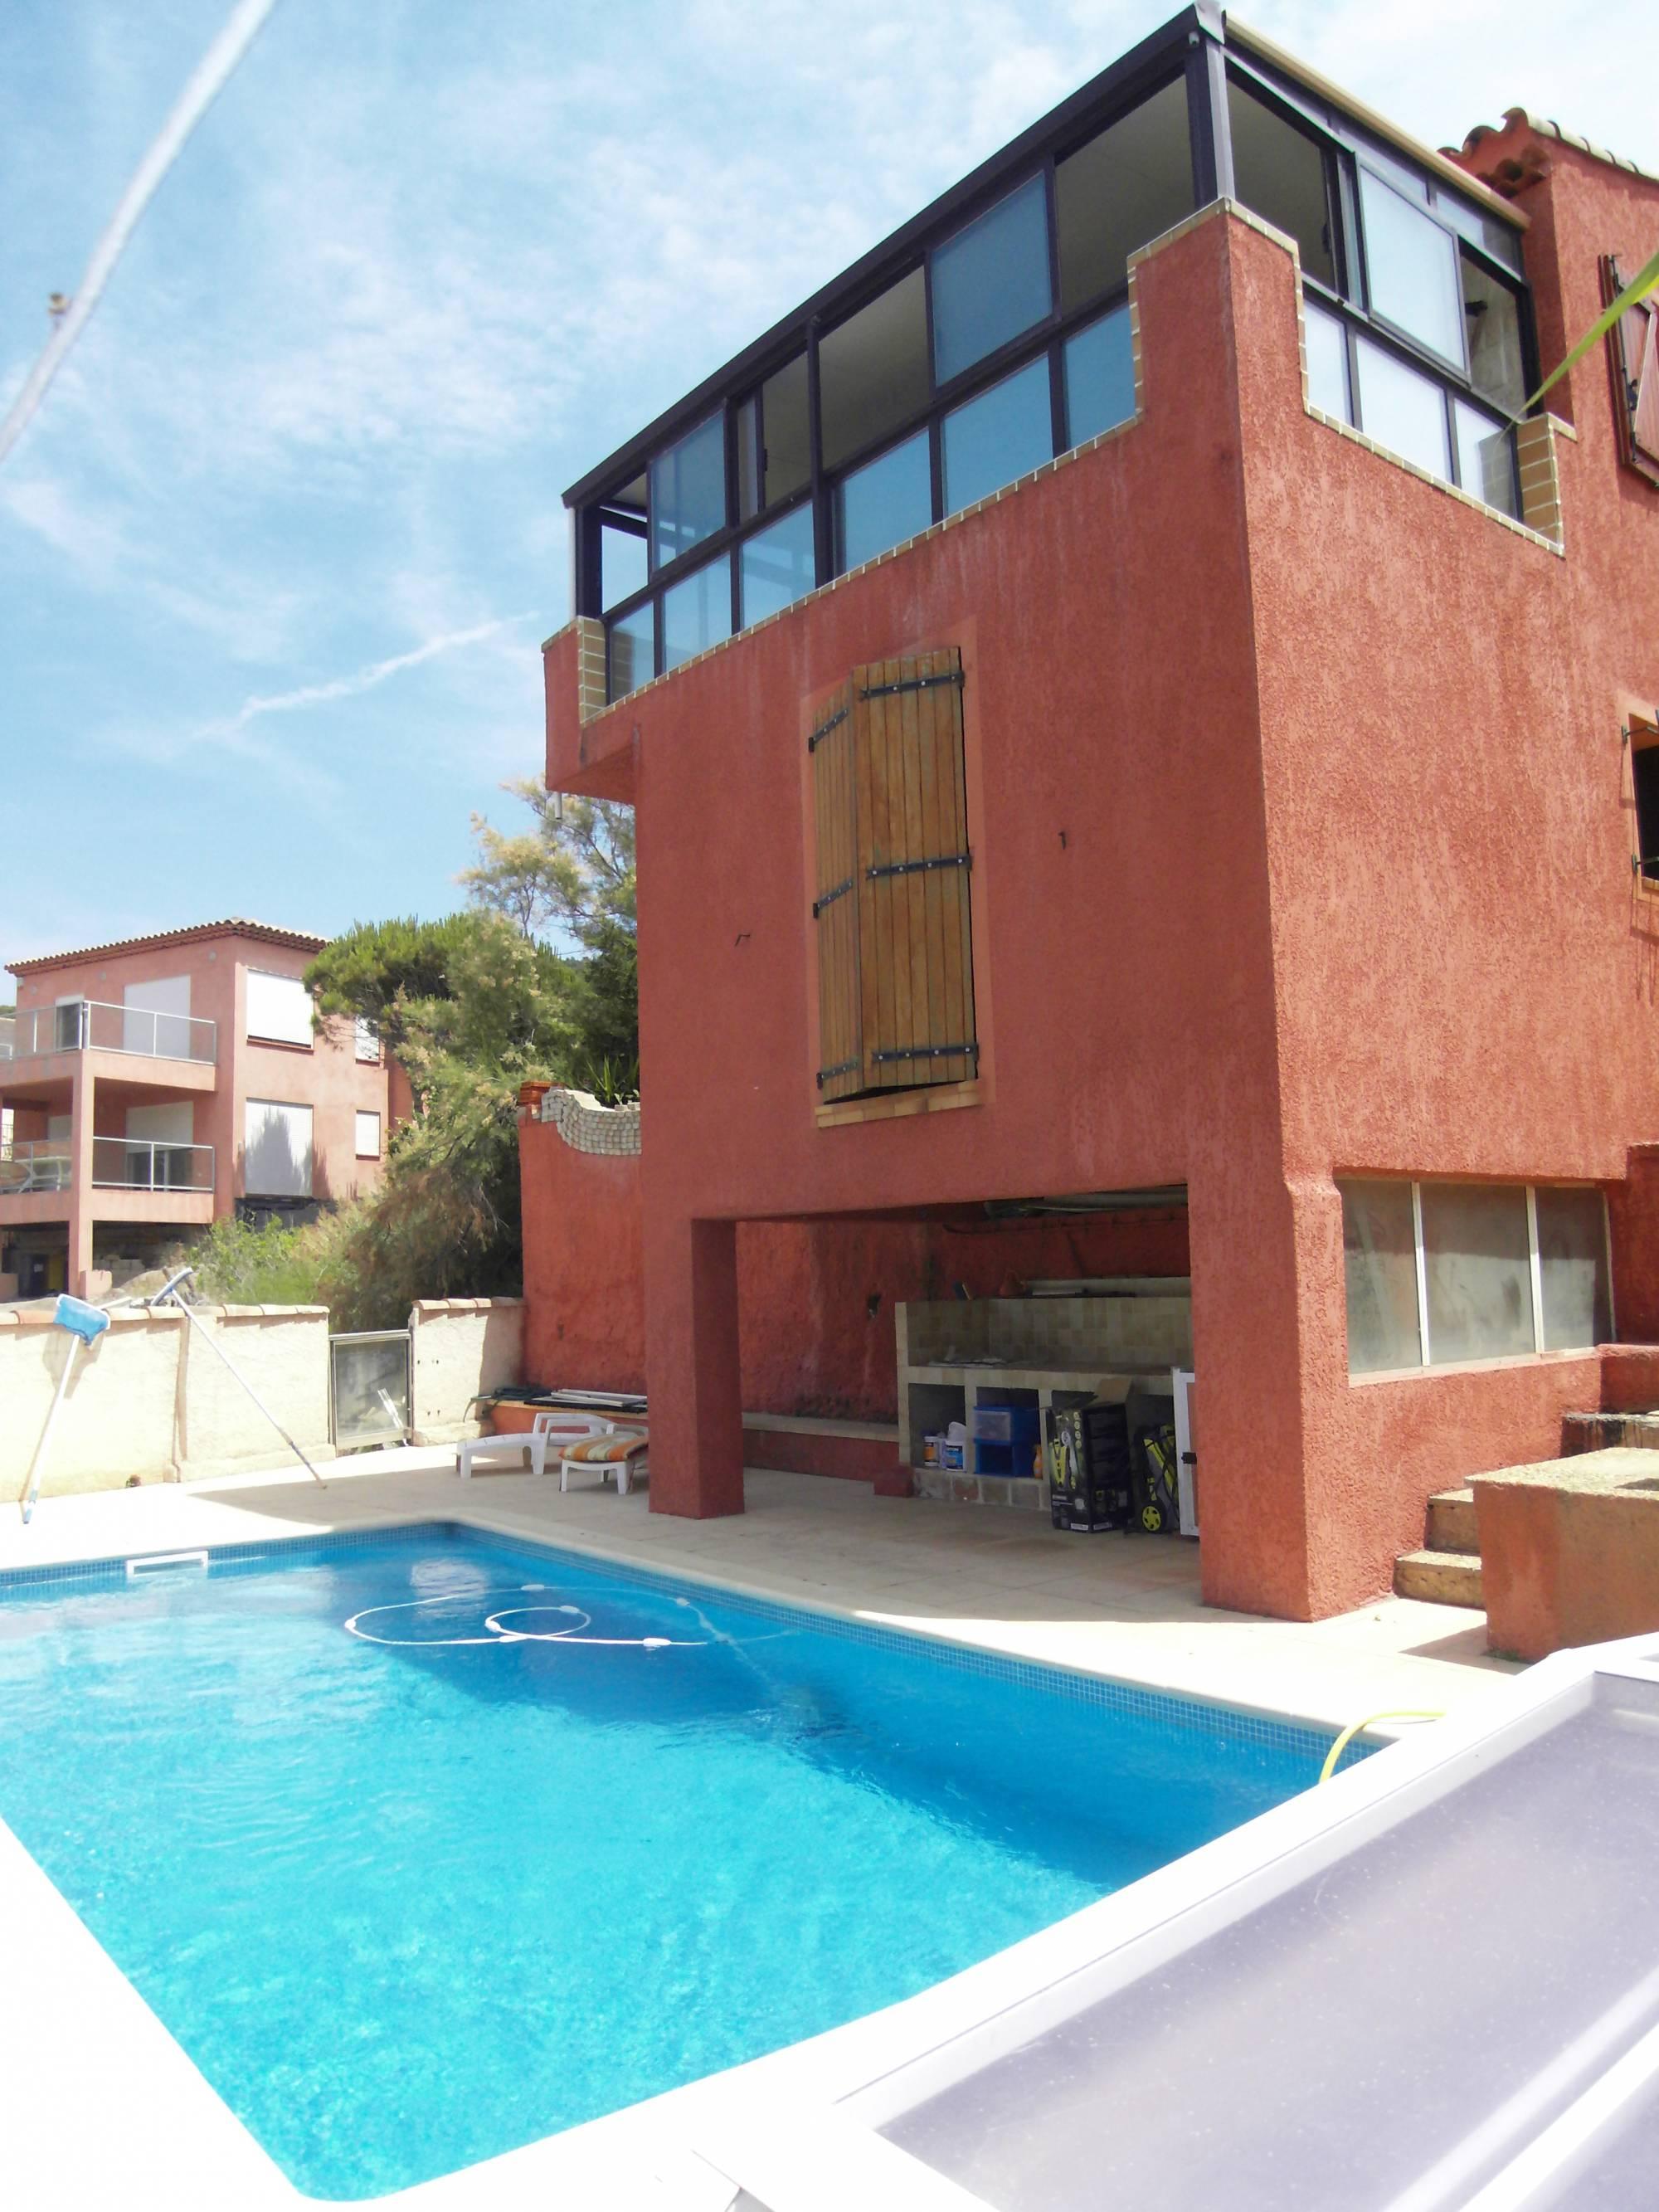 963894a40f2608 A vendre maison avec piscine bord de mer Marseille 13008 ...